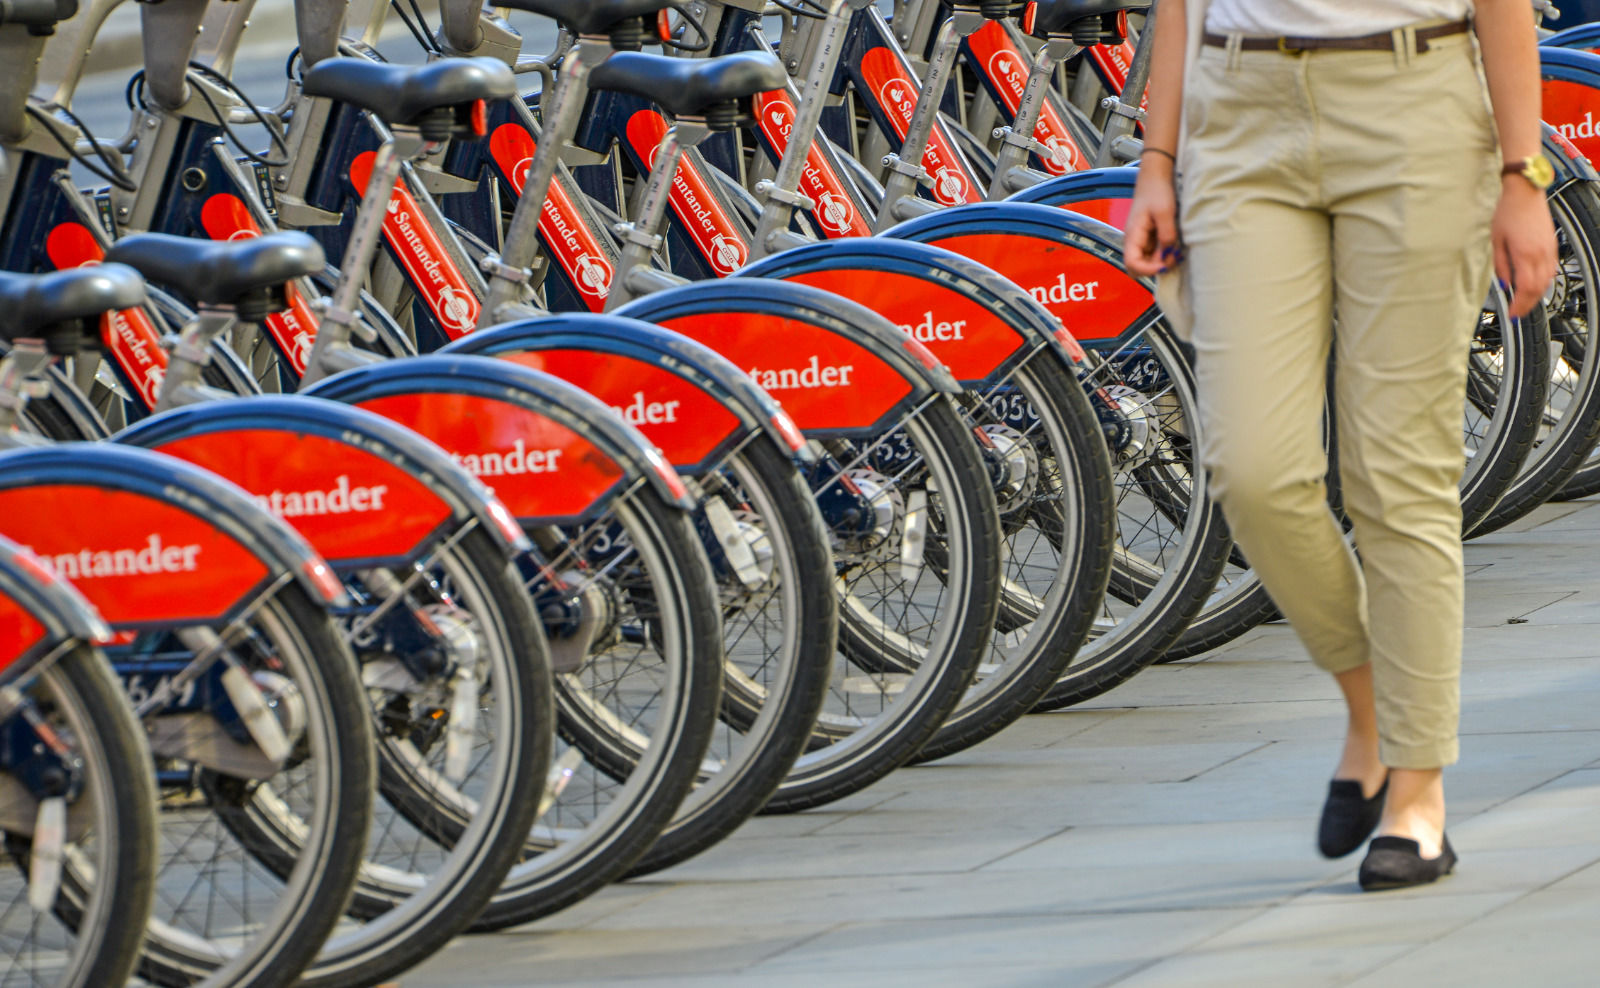 local london area photo boris bike